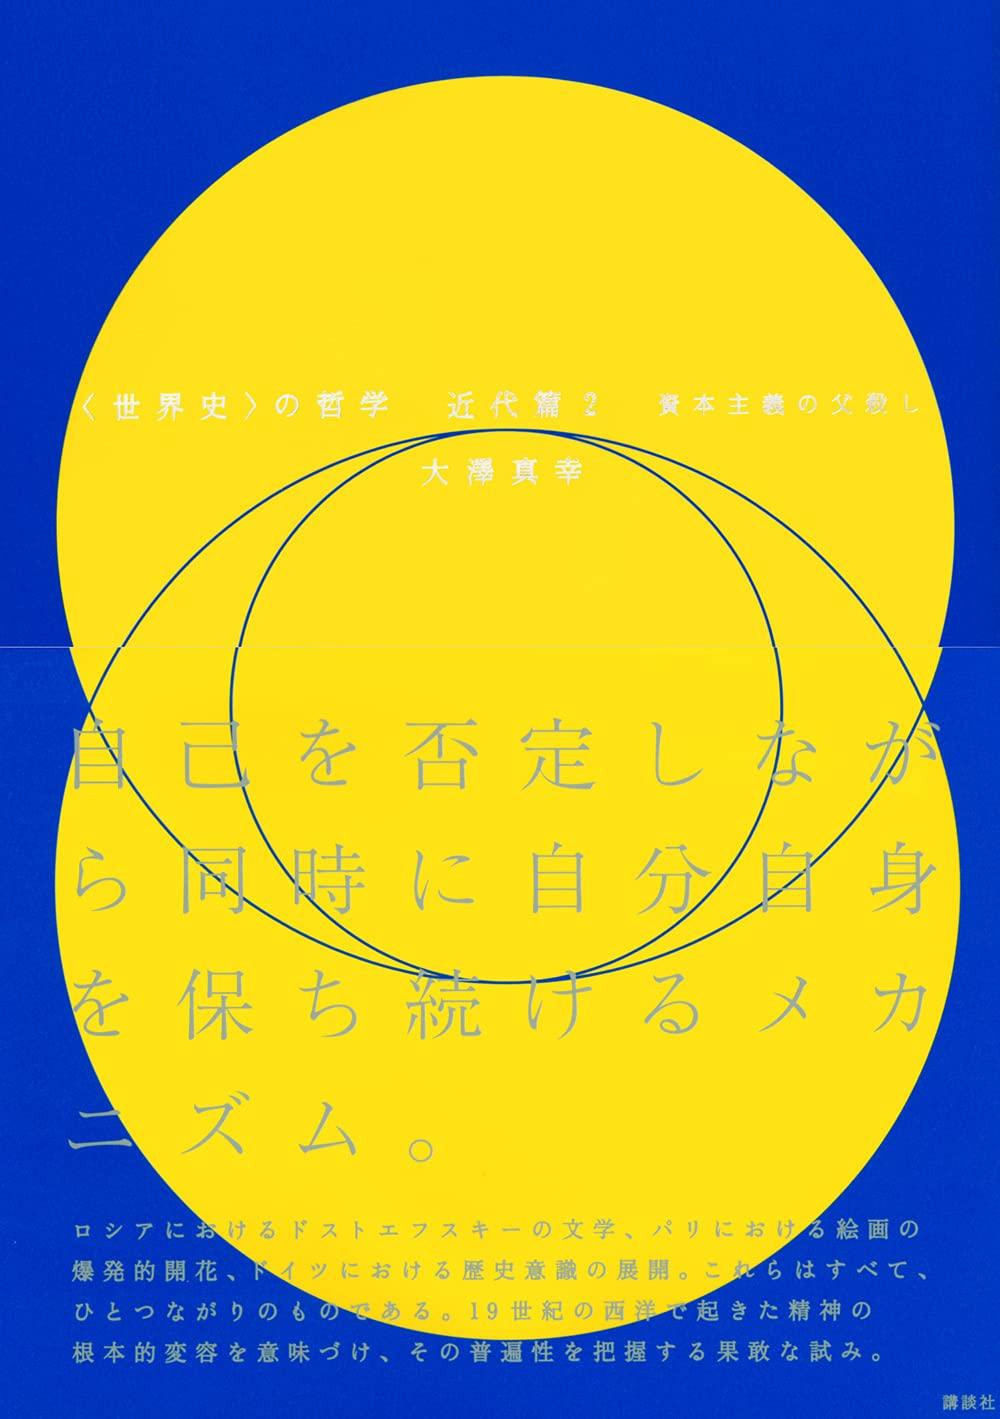 【新刊】『〈世界史〉の哲学 近代篇2 資本主義の父殺し』